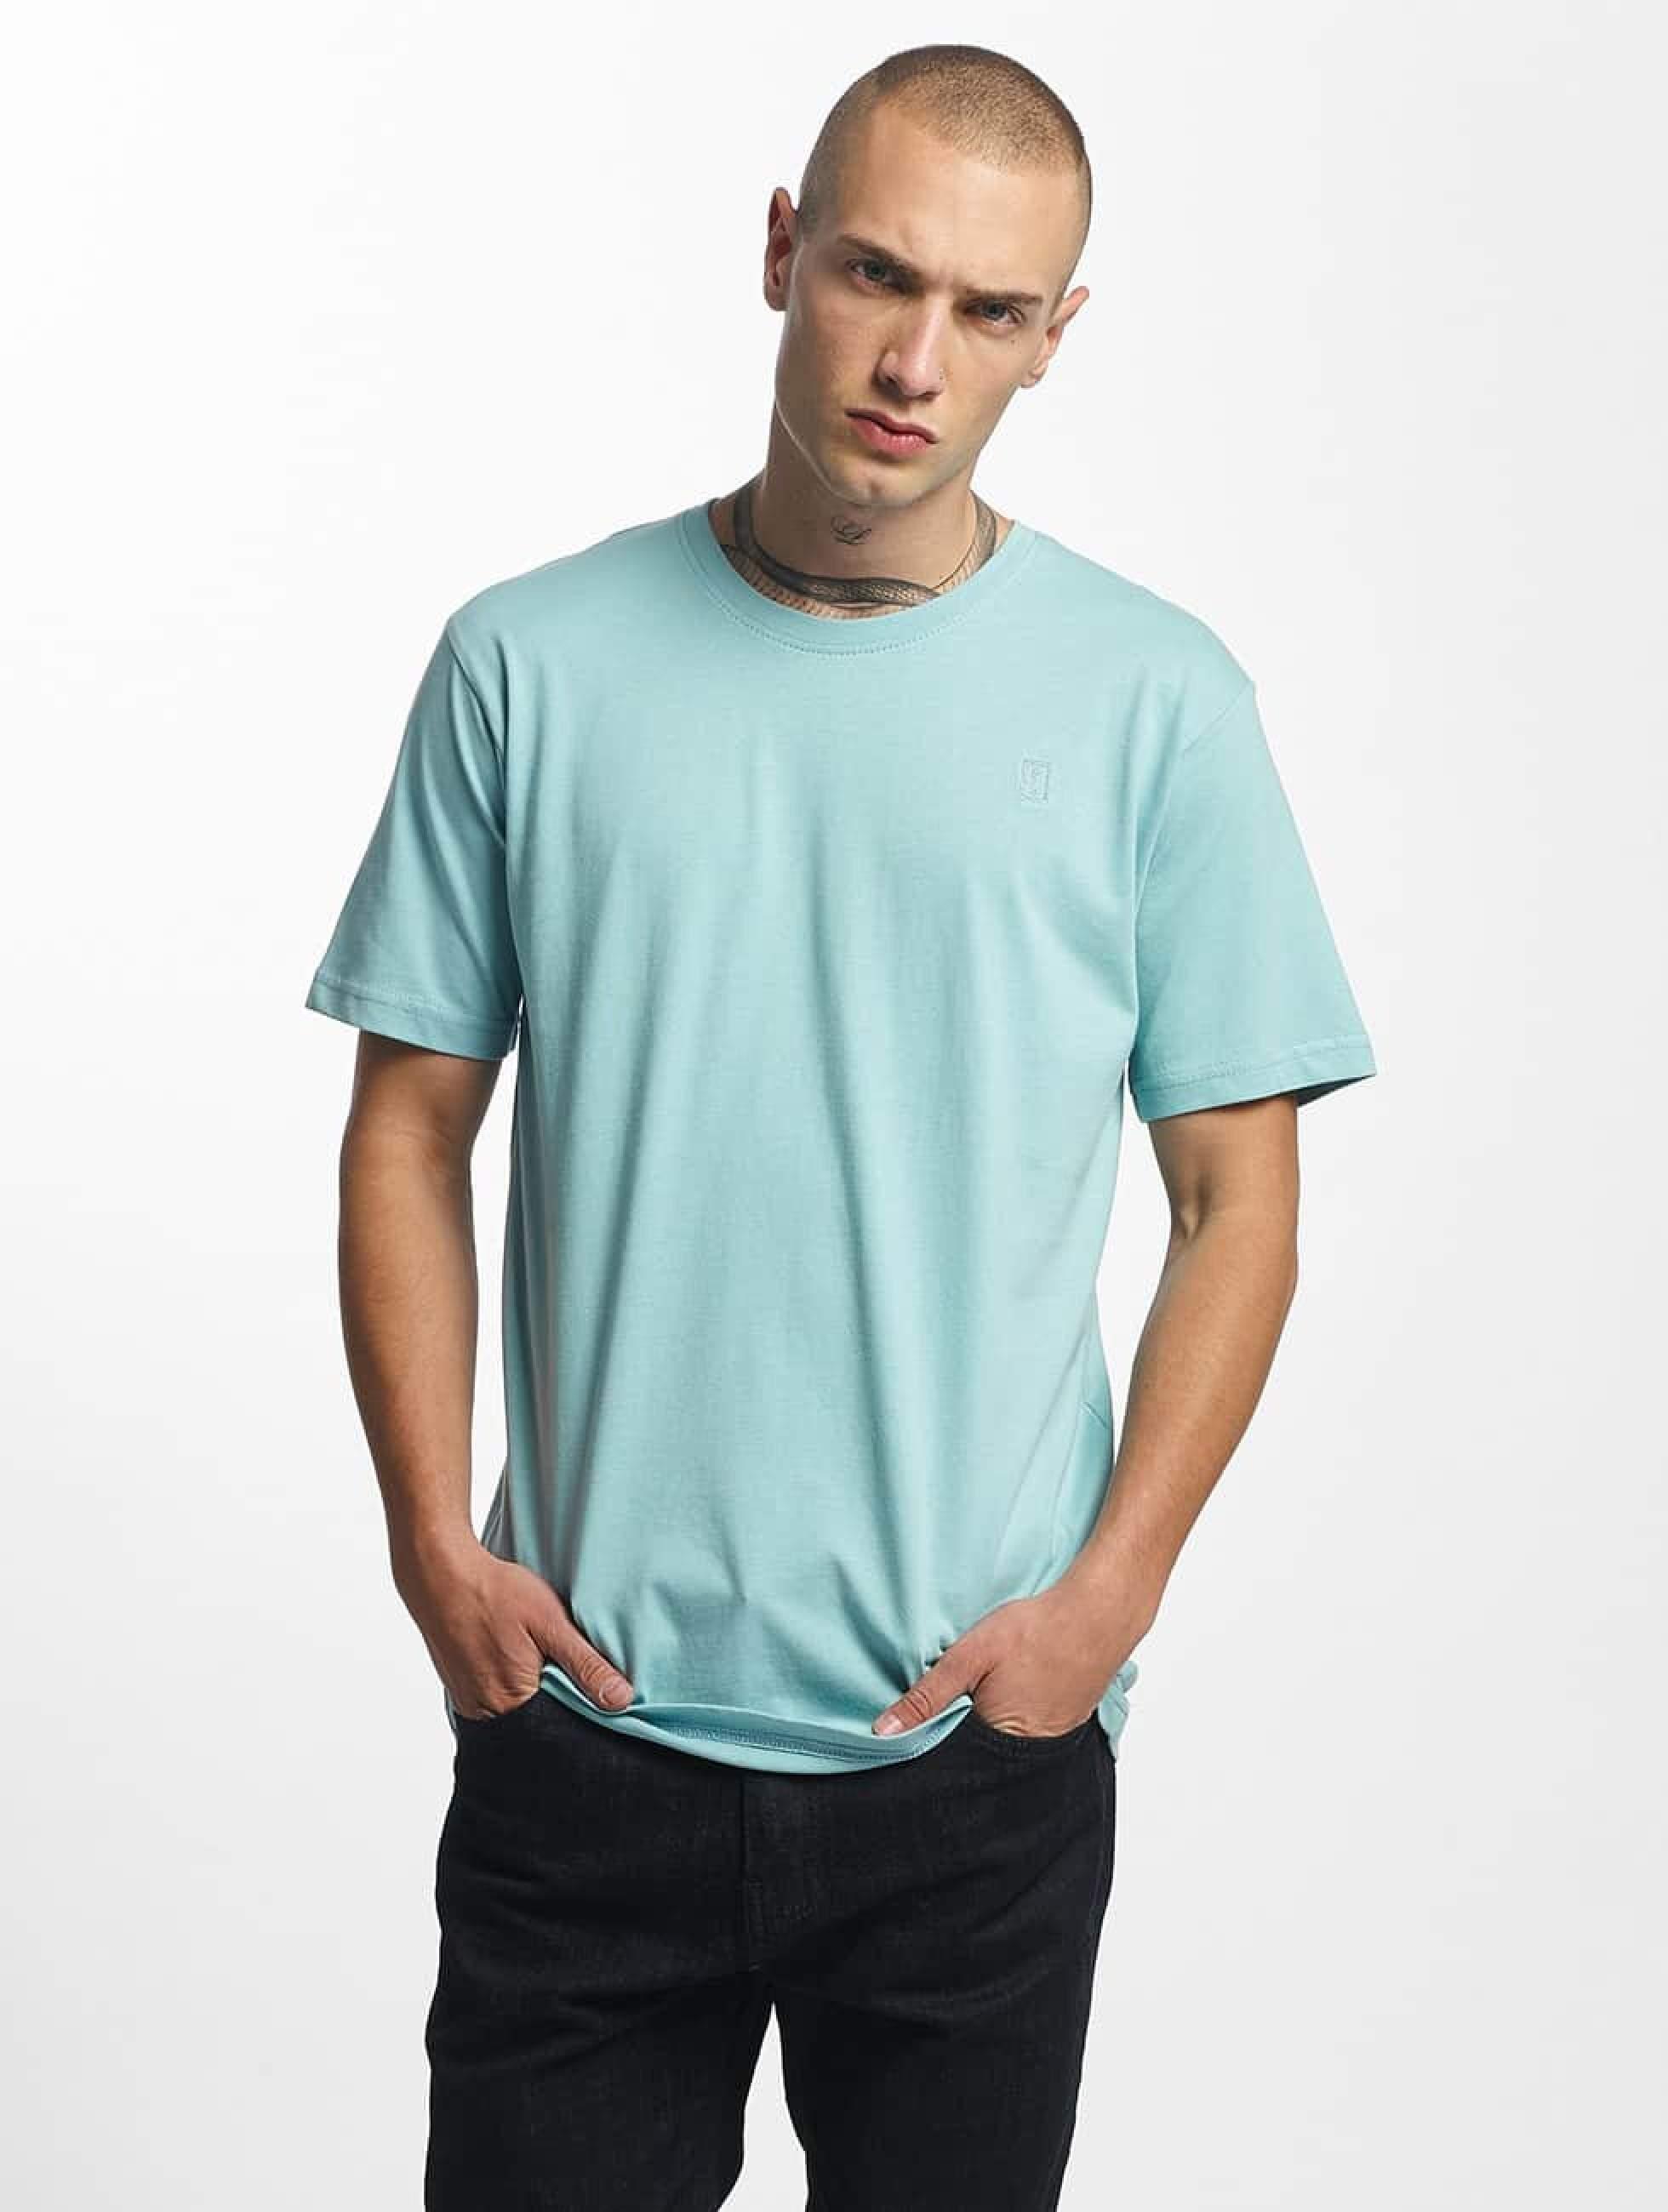 Cyprime / T-Shirt Titanium in turquoise S